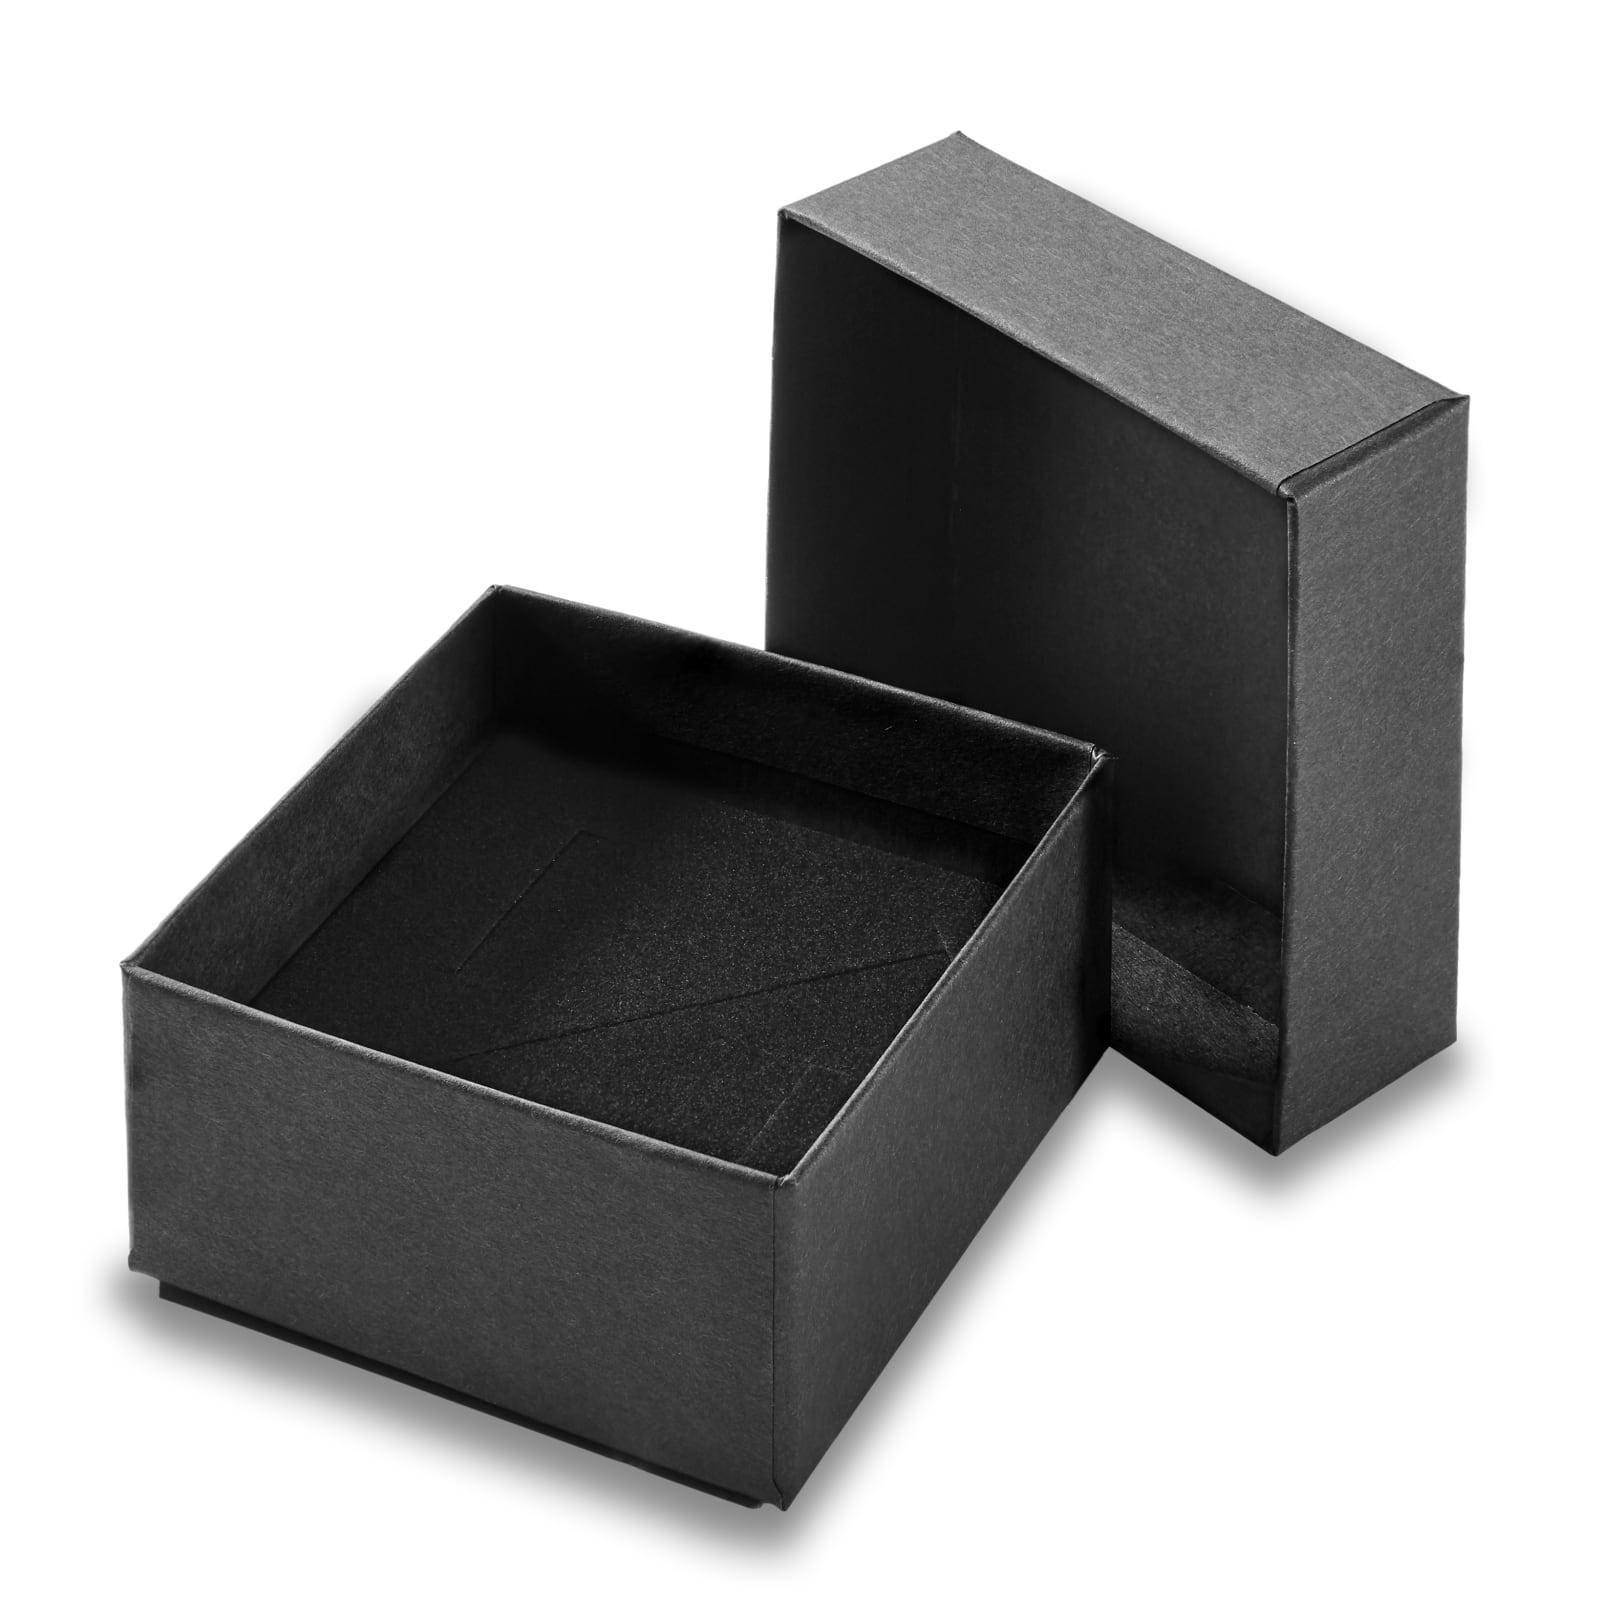 5563e8ca14b Κουτί Δώρου για Κλιπ Γραβάτας/Μανικετόκουμπα | Σε απόθεμα! | Trendhim